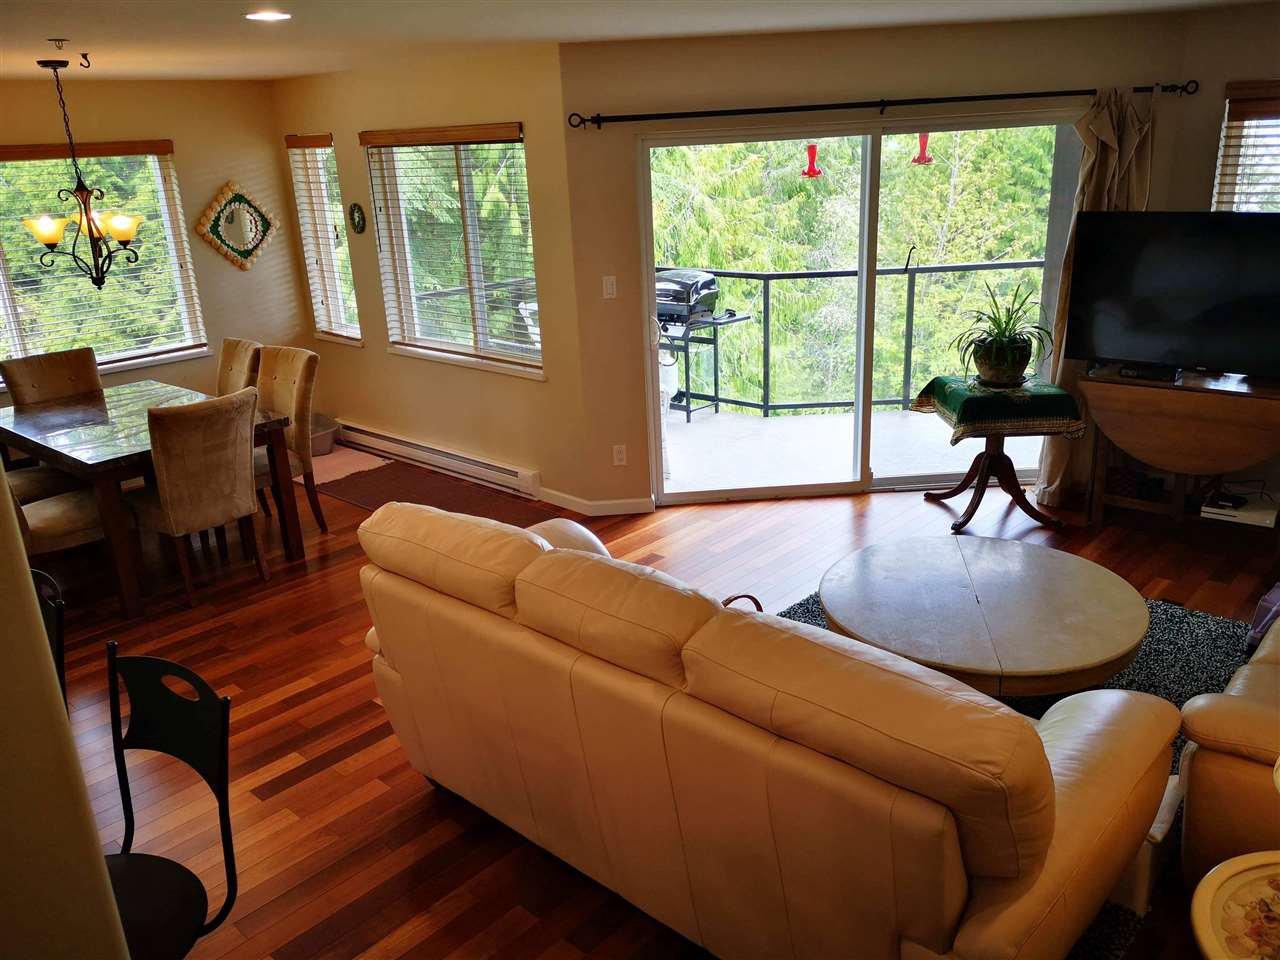 "Photo 3: Photos: W201 5780 TRAIL Avenue in Sechelt: Sechelt District Condo for sale in ""THE BLUFF"" (Sunshine Coast)  : MLS®# R2409652"